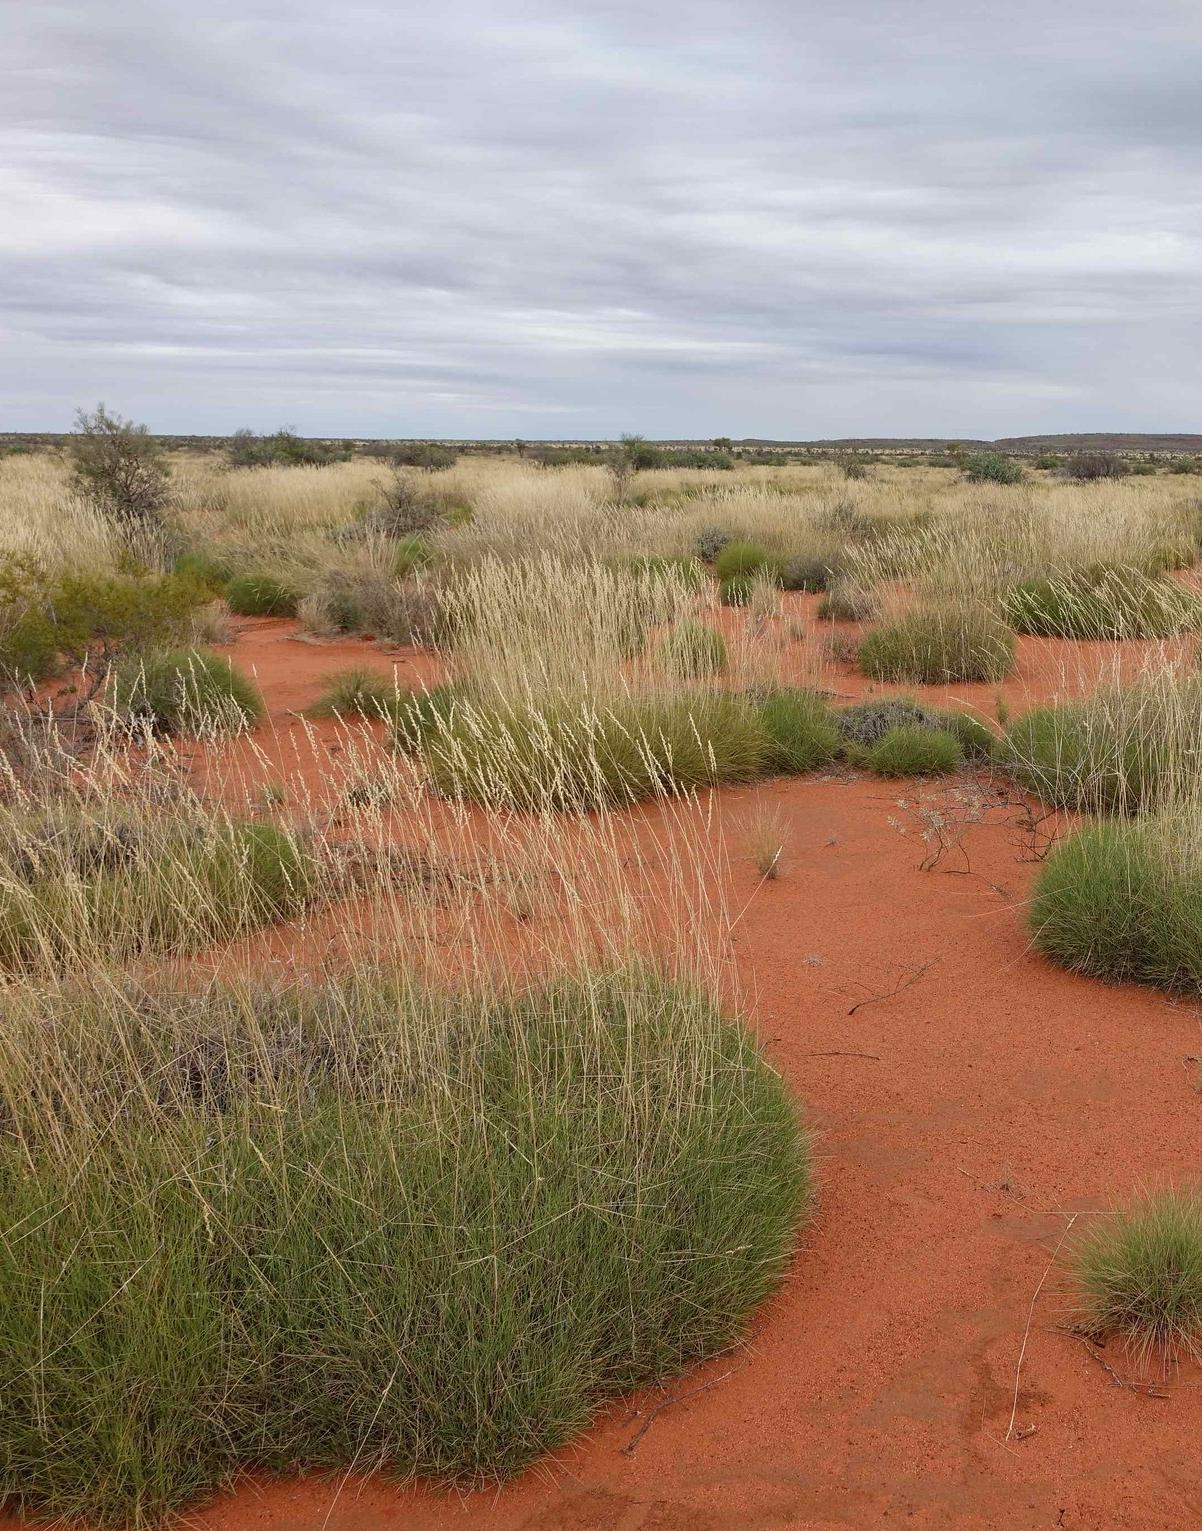 spinifex-hummock-bunchgrass-central-arid-Australia-habitat-bilby